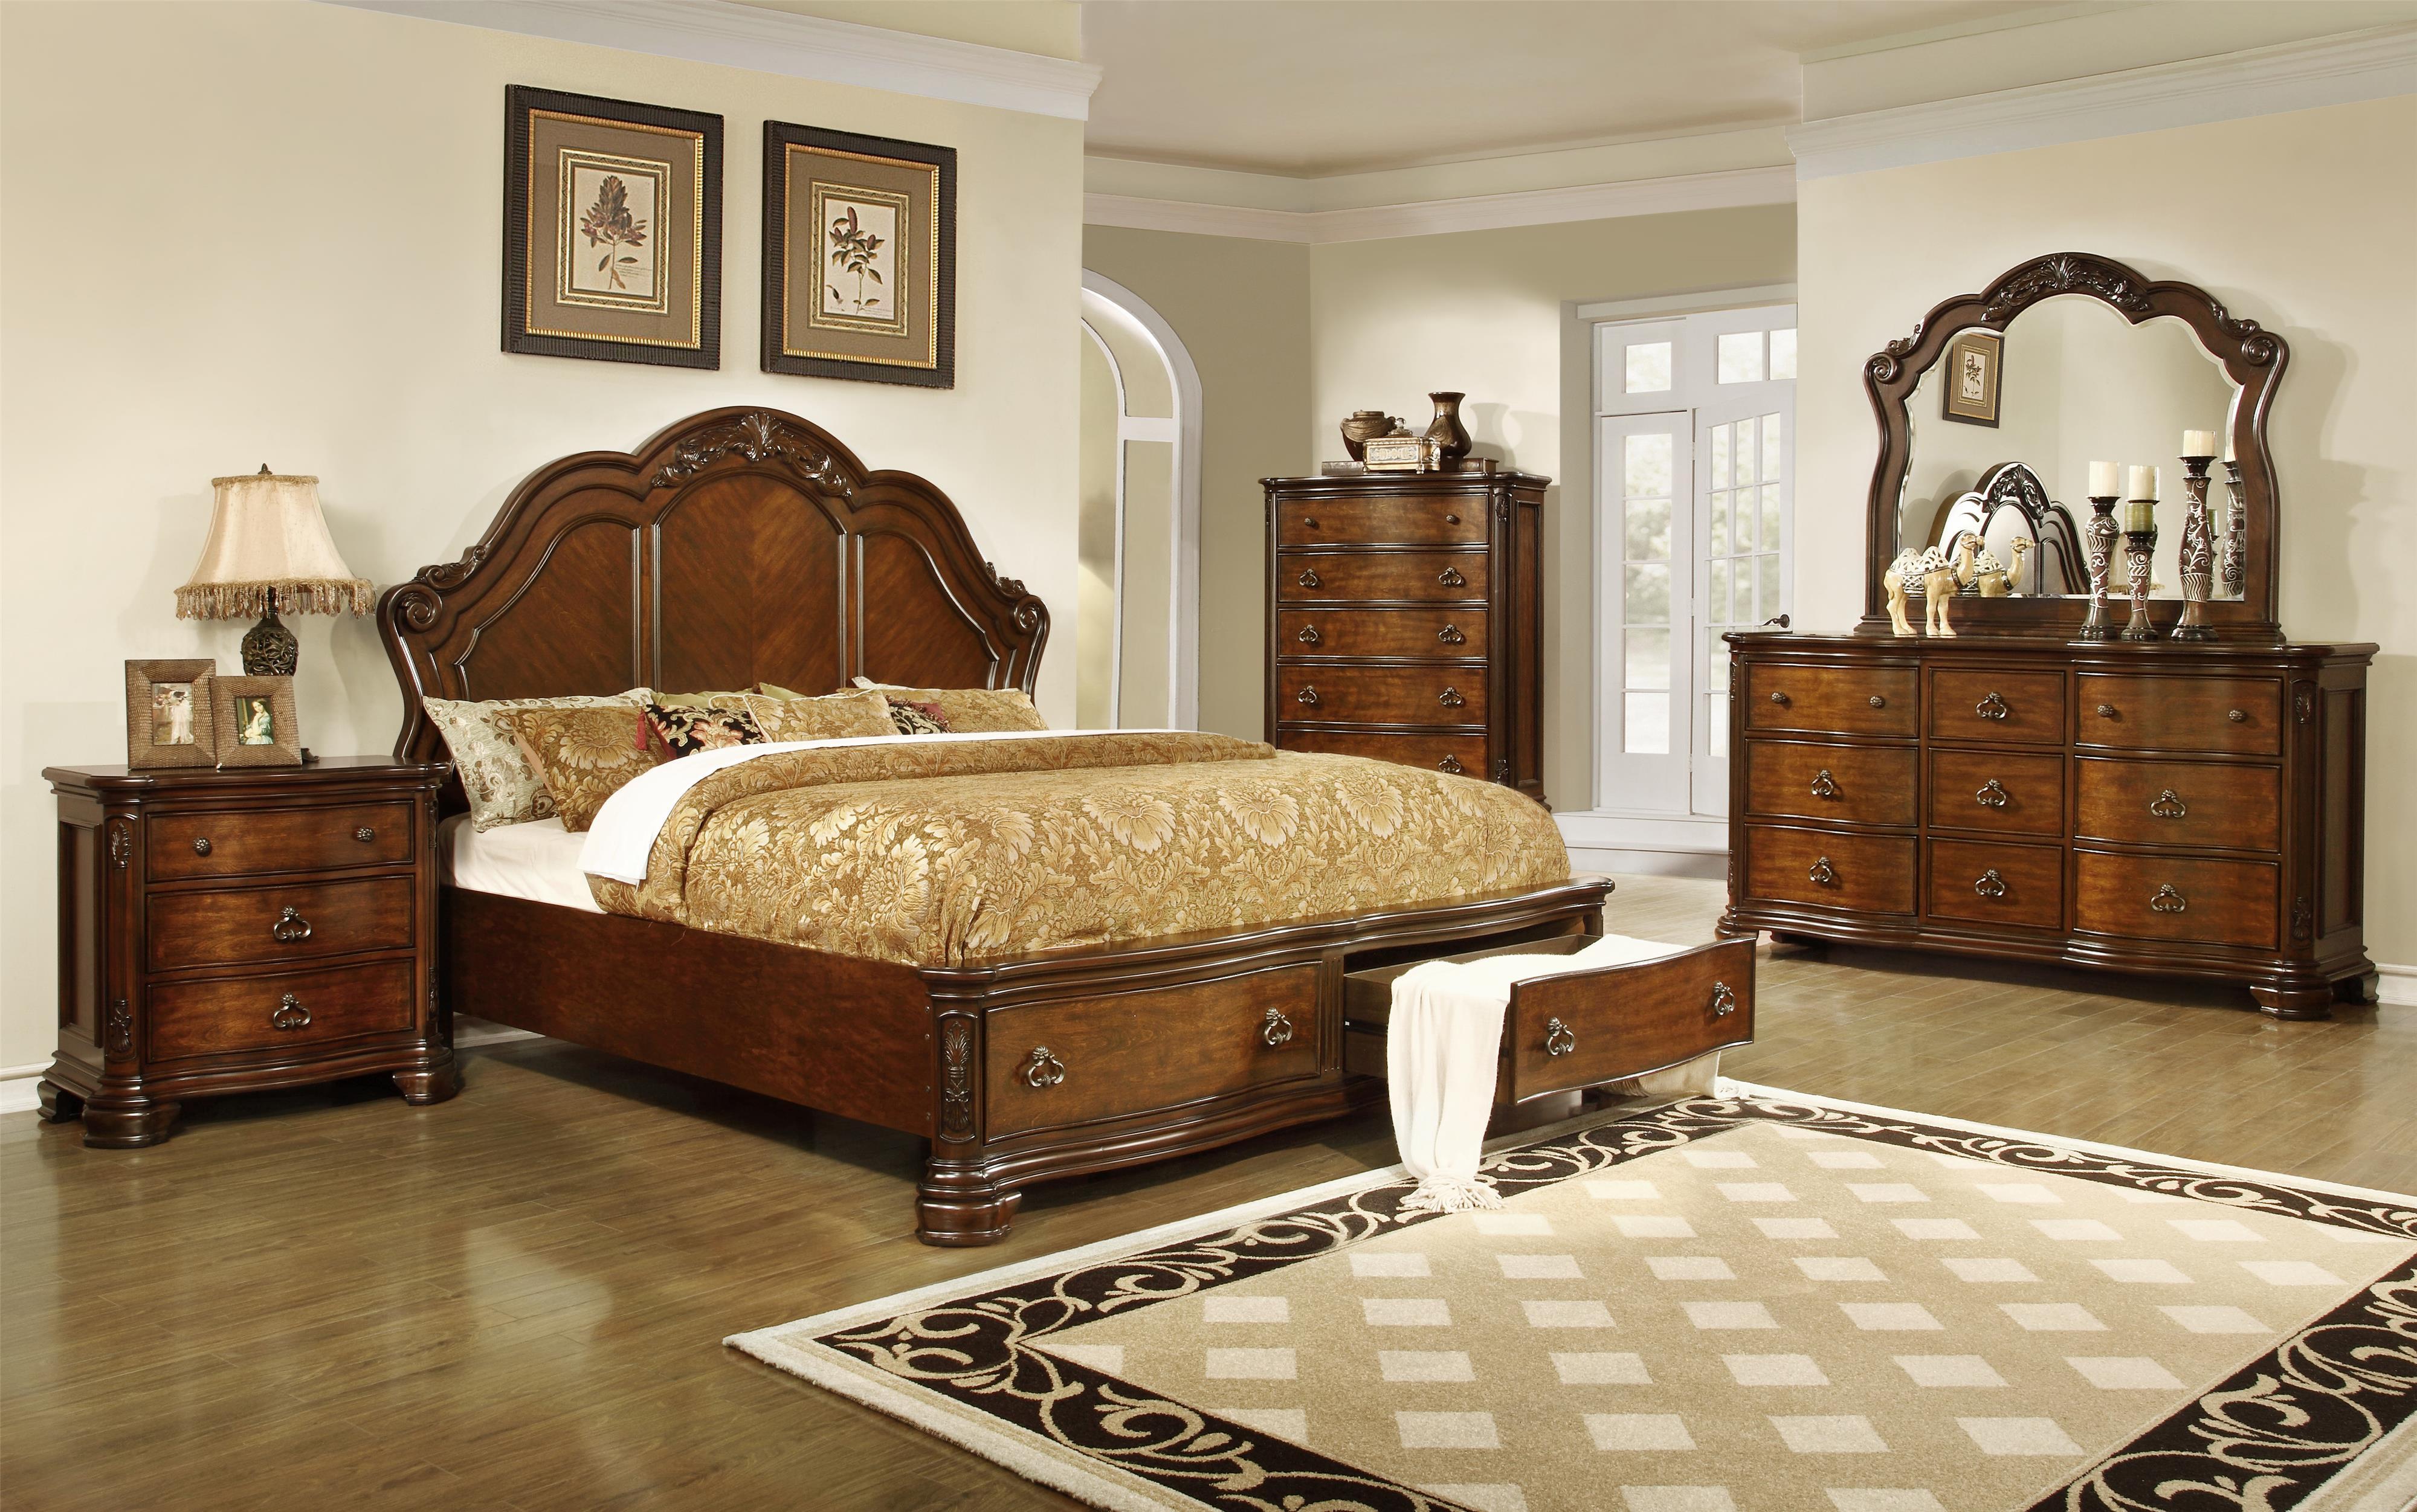 Lifestyle Tobacco King Bedroom Group - Item Number: 5390A K Bedroom Group 1